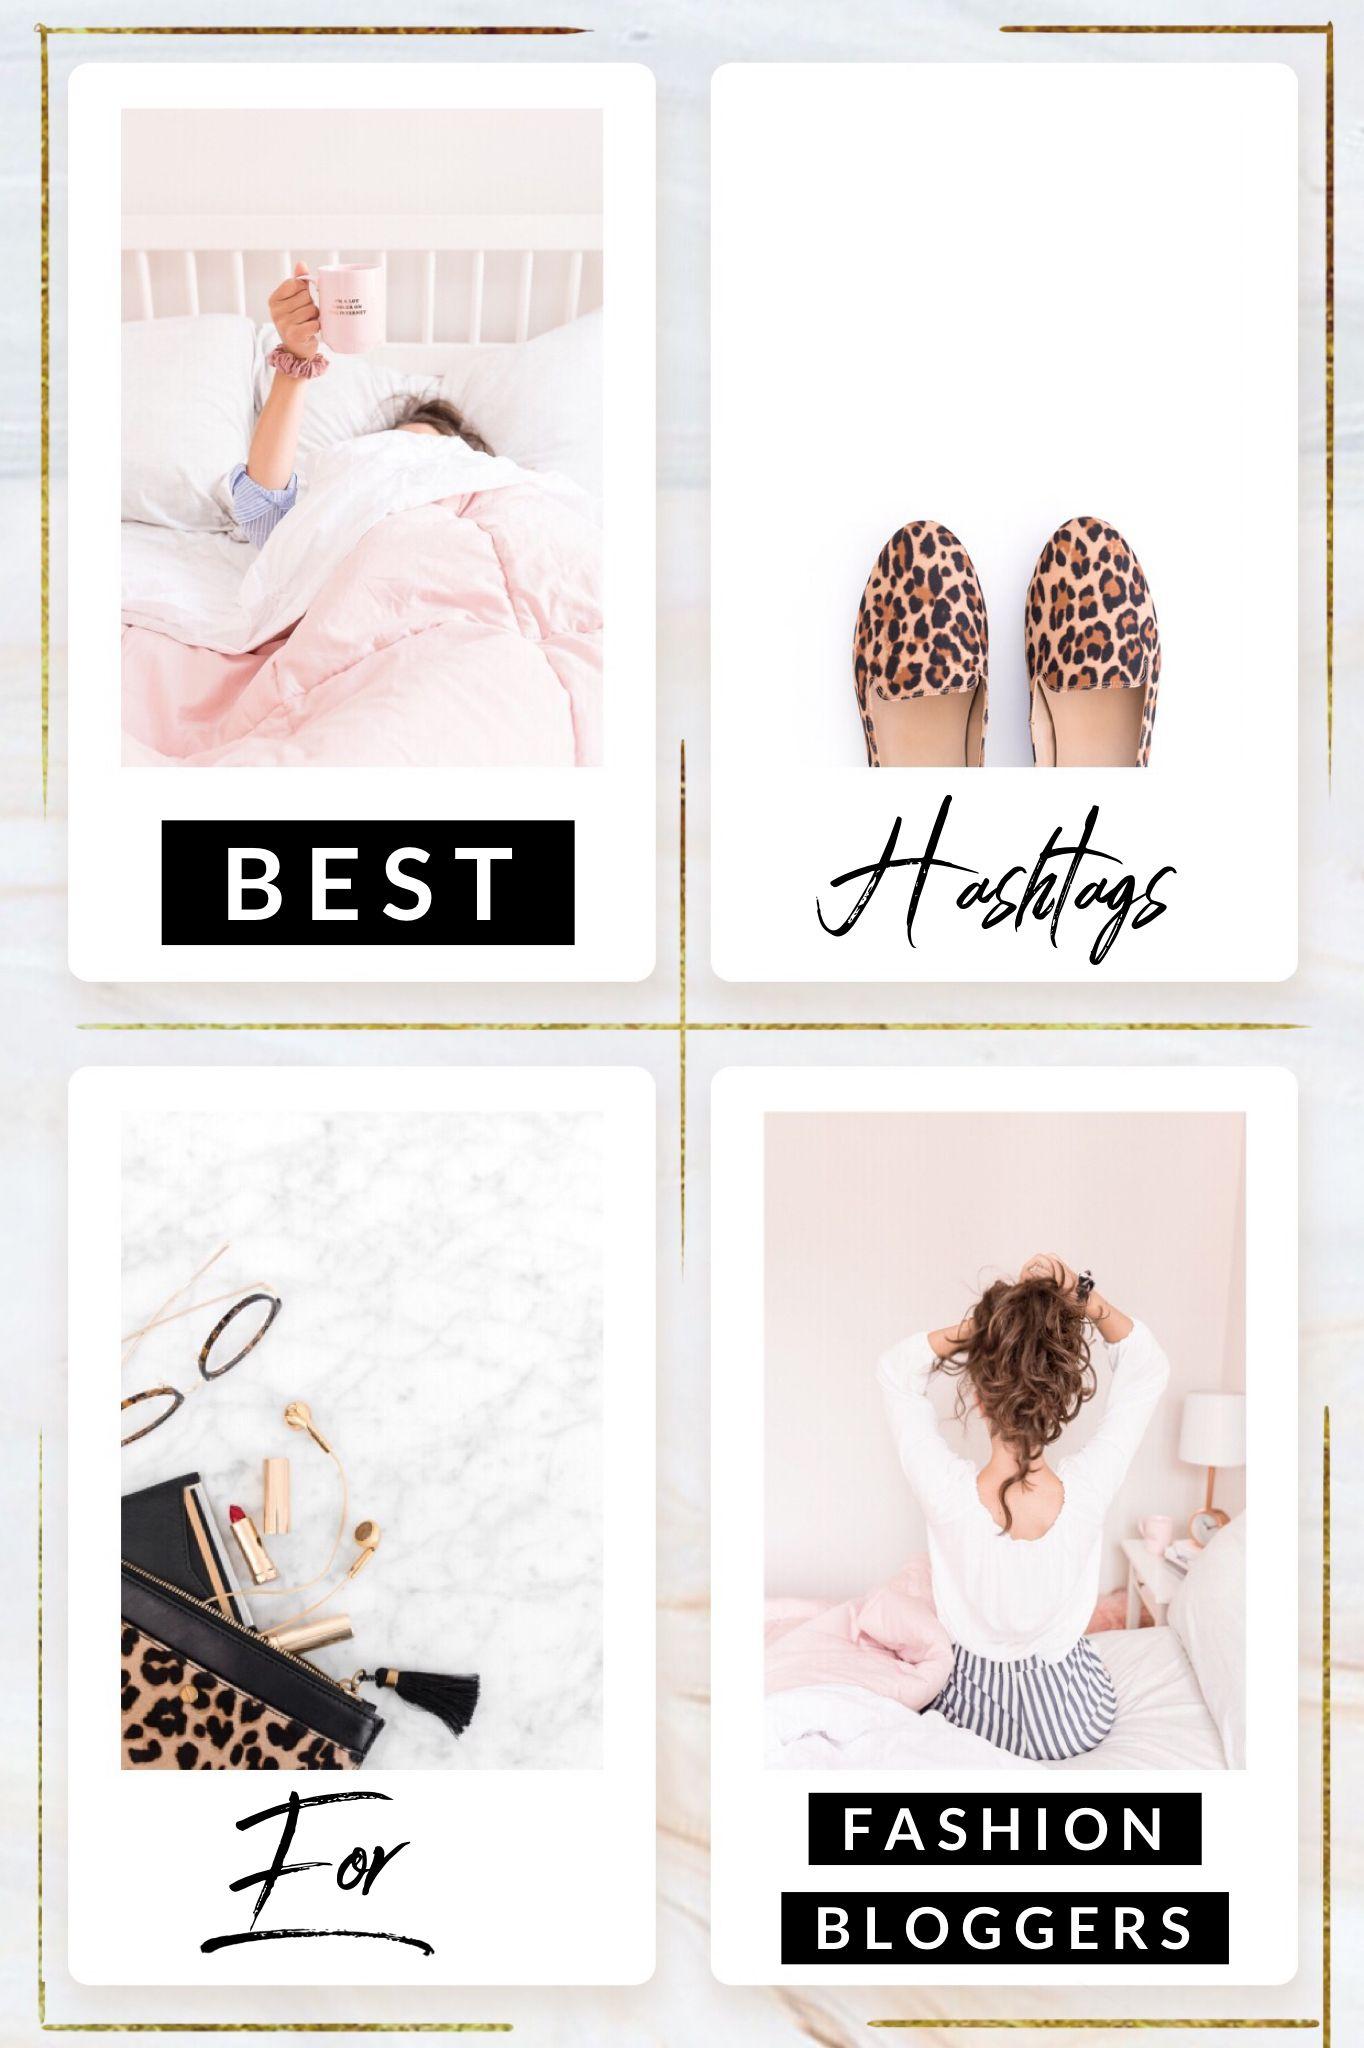 Fashion Hashtags For Instagram Fashion Hashtags Instagram Theme Social Media Design